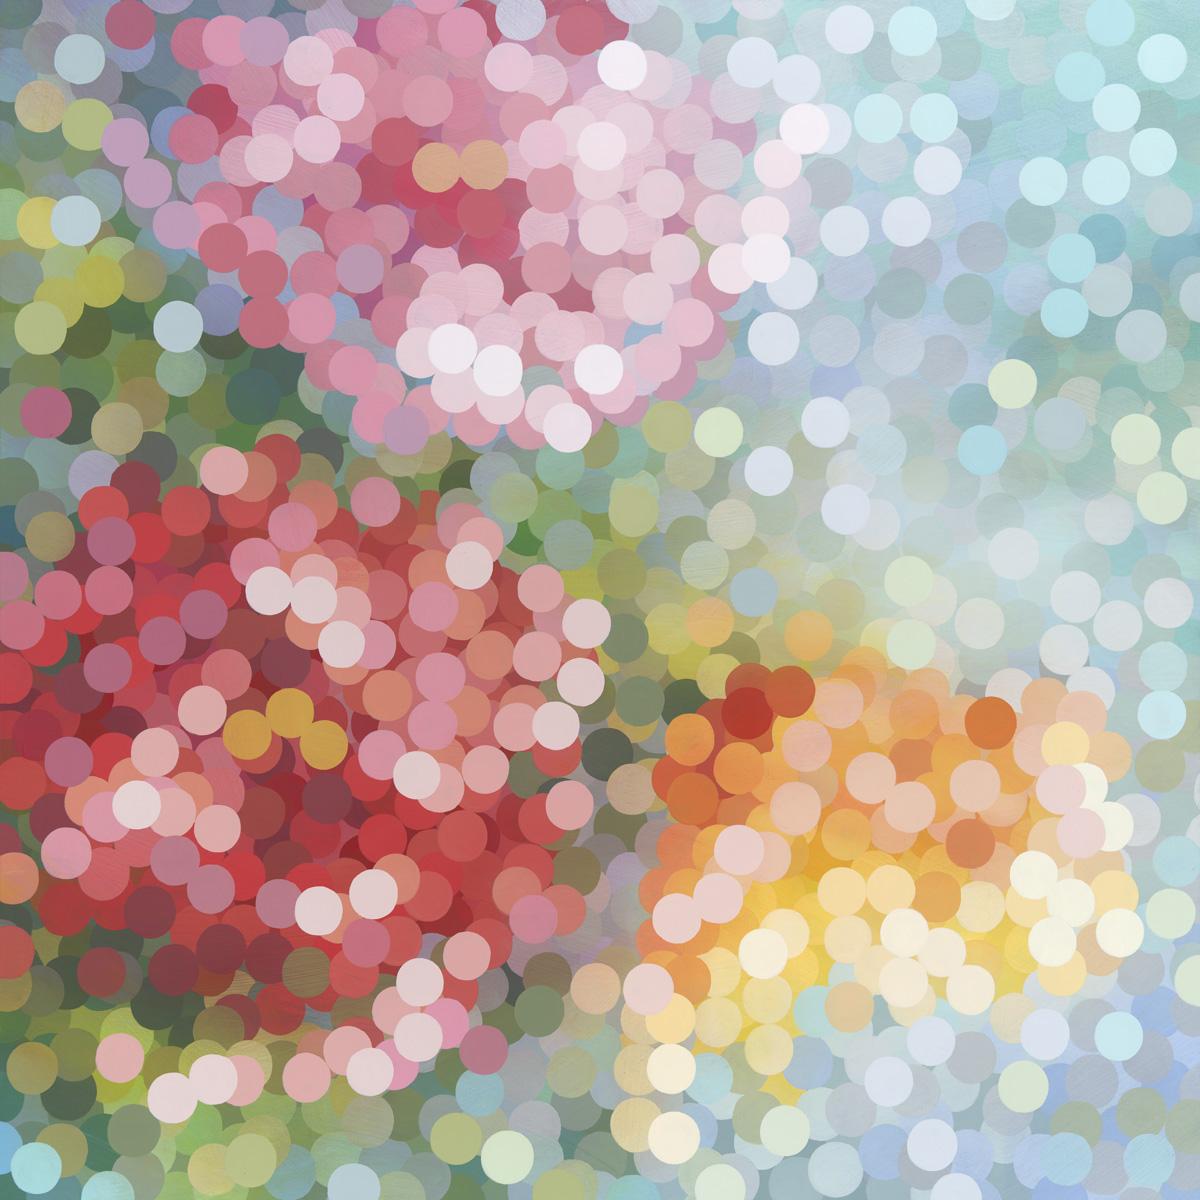 Art of the day by Rachelle Kearns